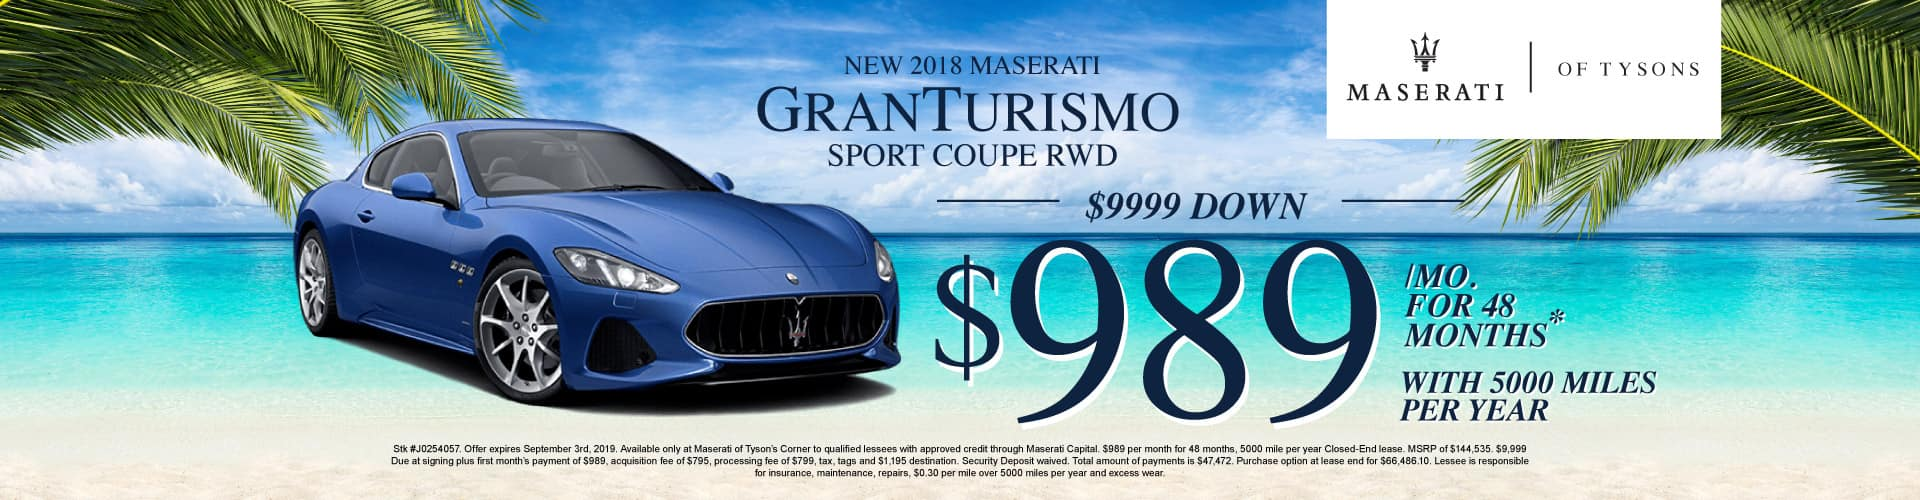 GranTurismo Sport Coupe RWD Lease Specials